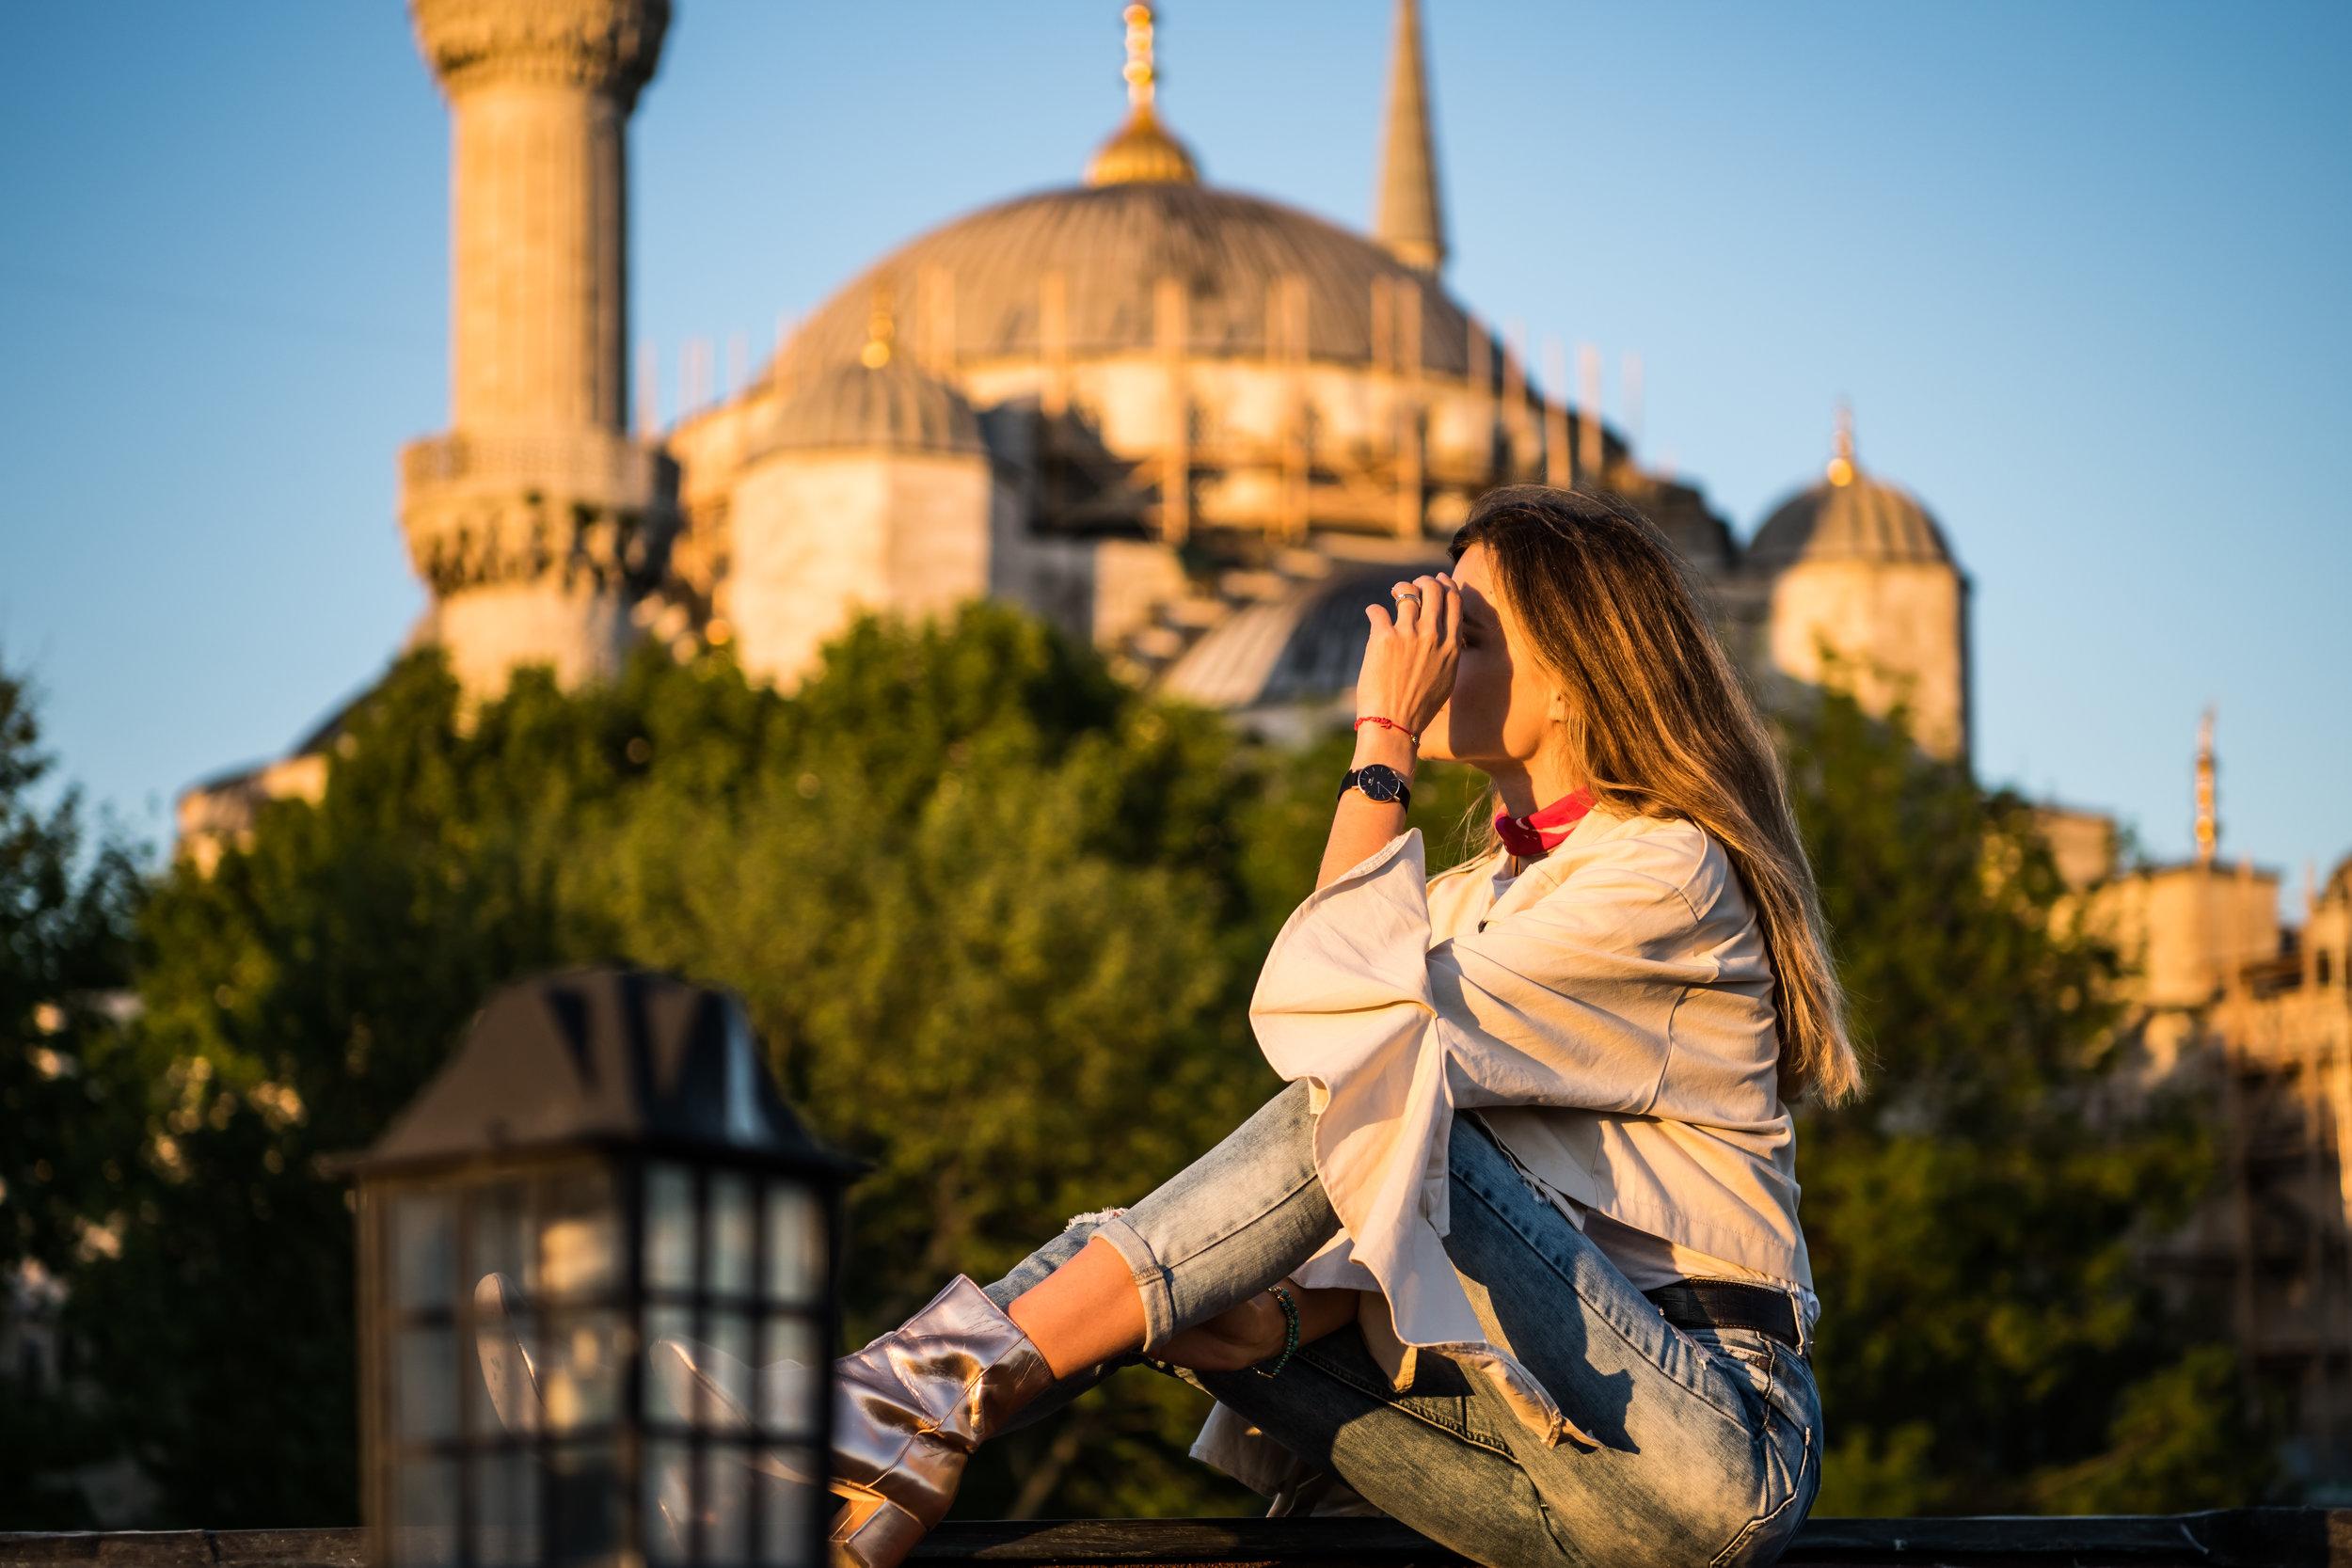 thetravelhub_istanbul_blue mosque-3224.jpg